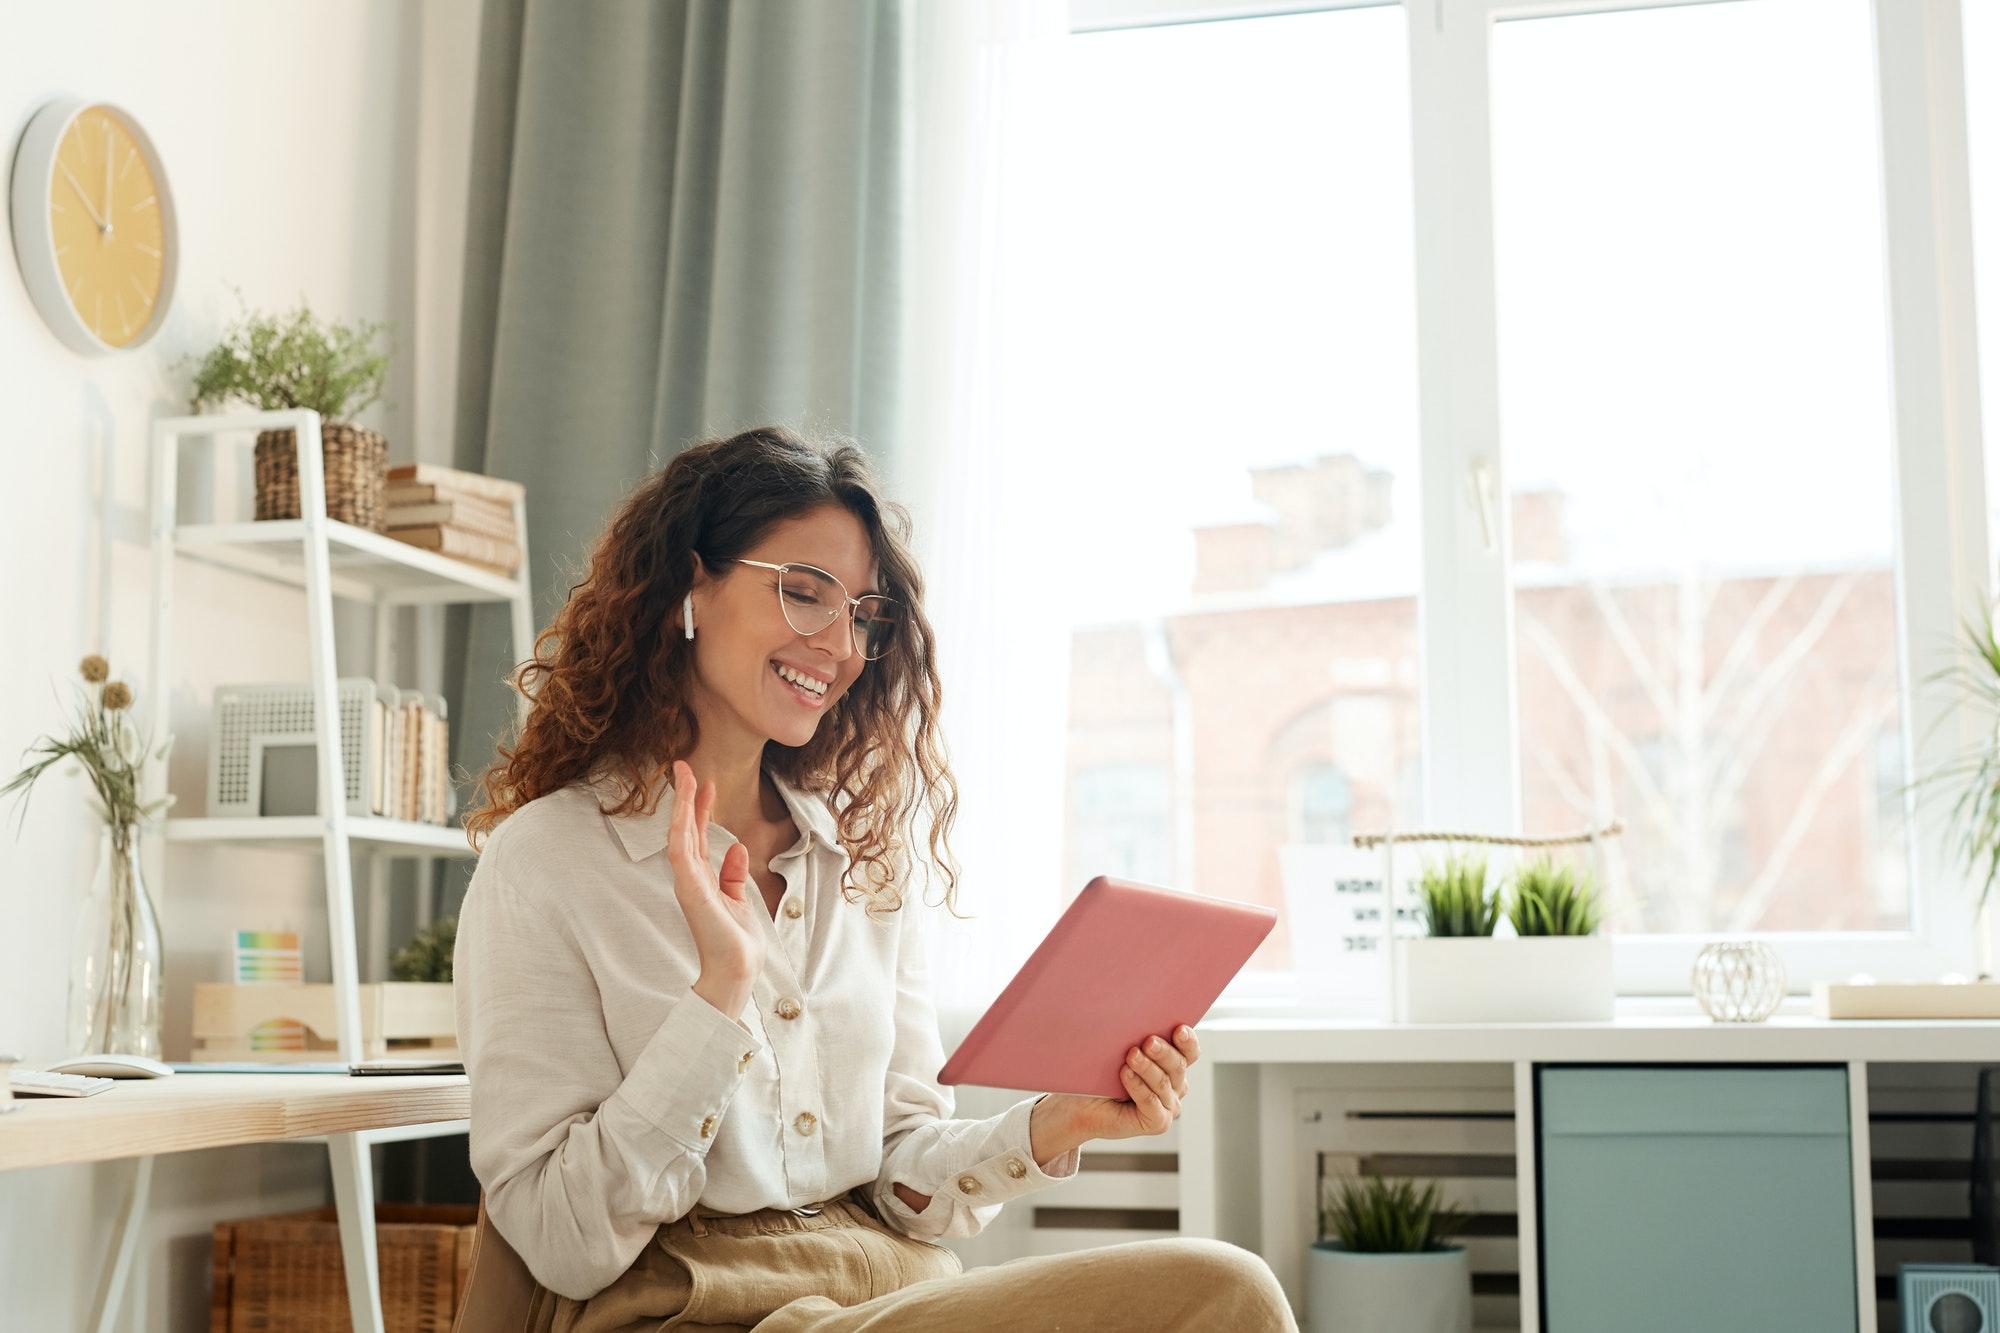 Businesswoman Speaking During Online Meeting